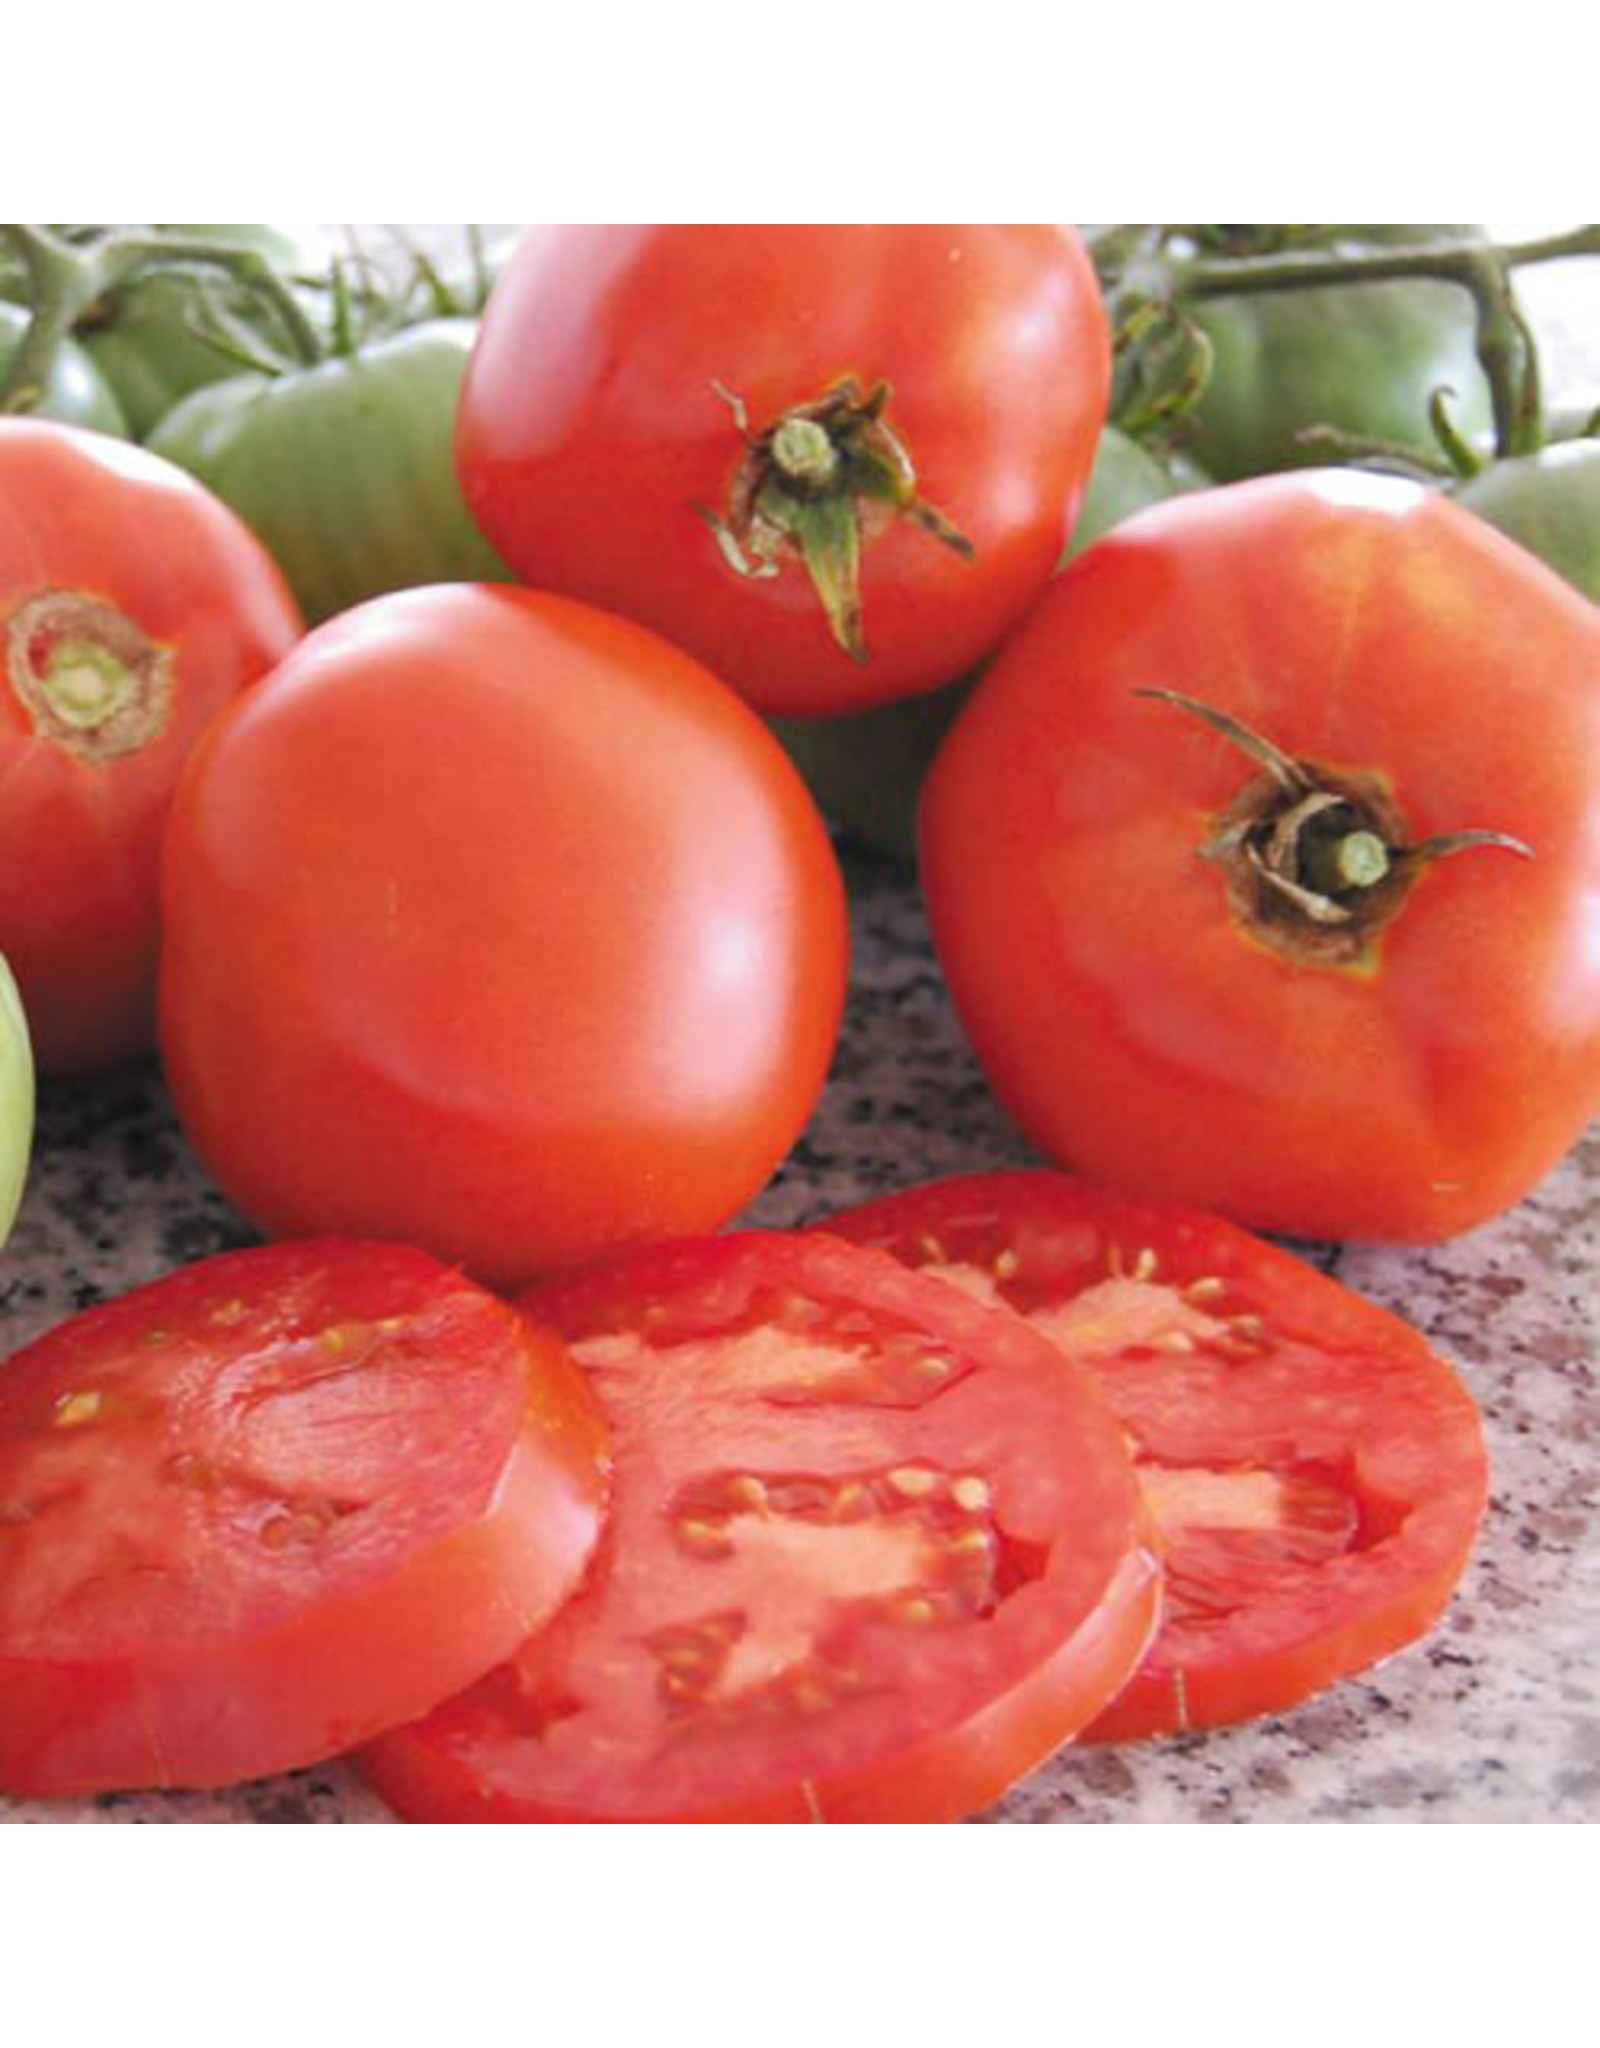 Seed Savers Tomato - Brandywine